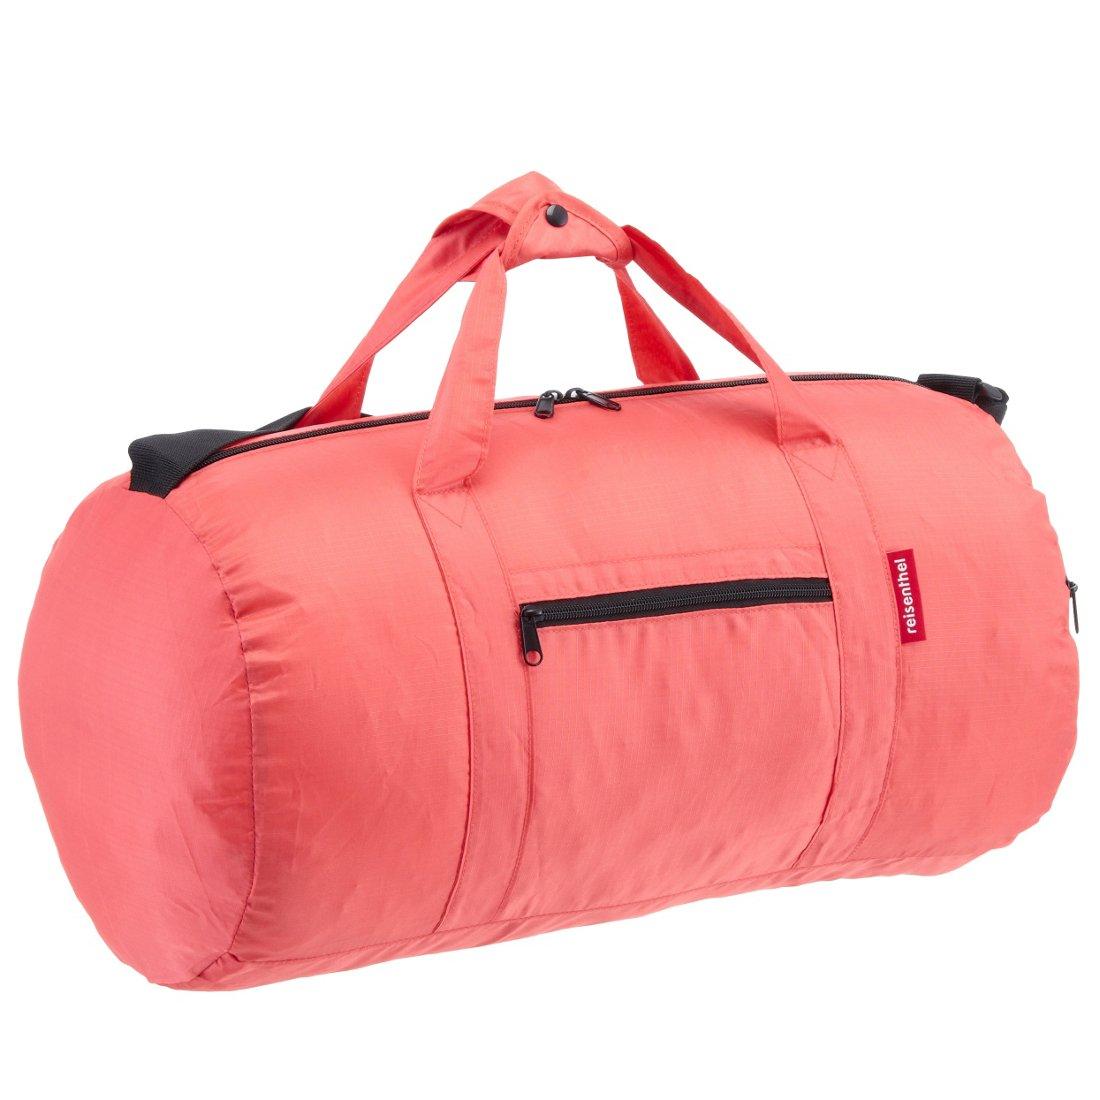 8aae76ce23 Reisenthel Travelling Mini Maxi Dufflebag Reisetasche 50 cm - coral -  koffer-direkt.de